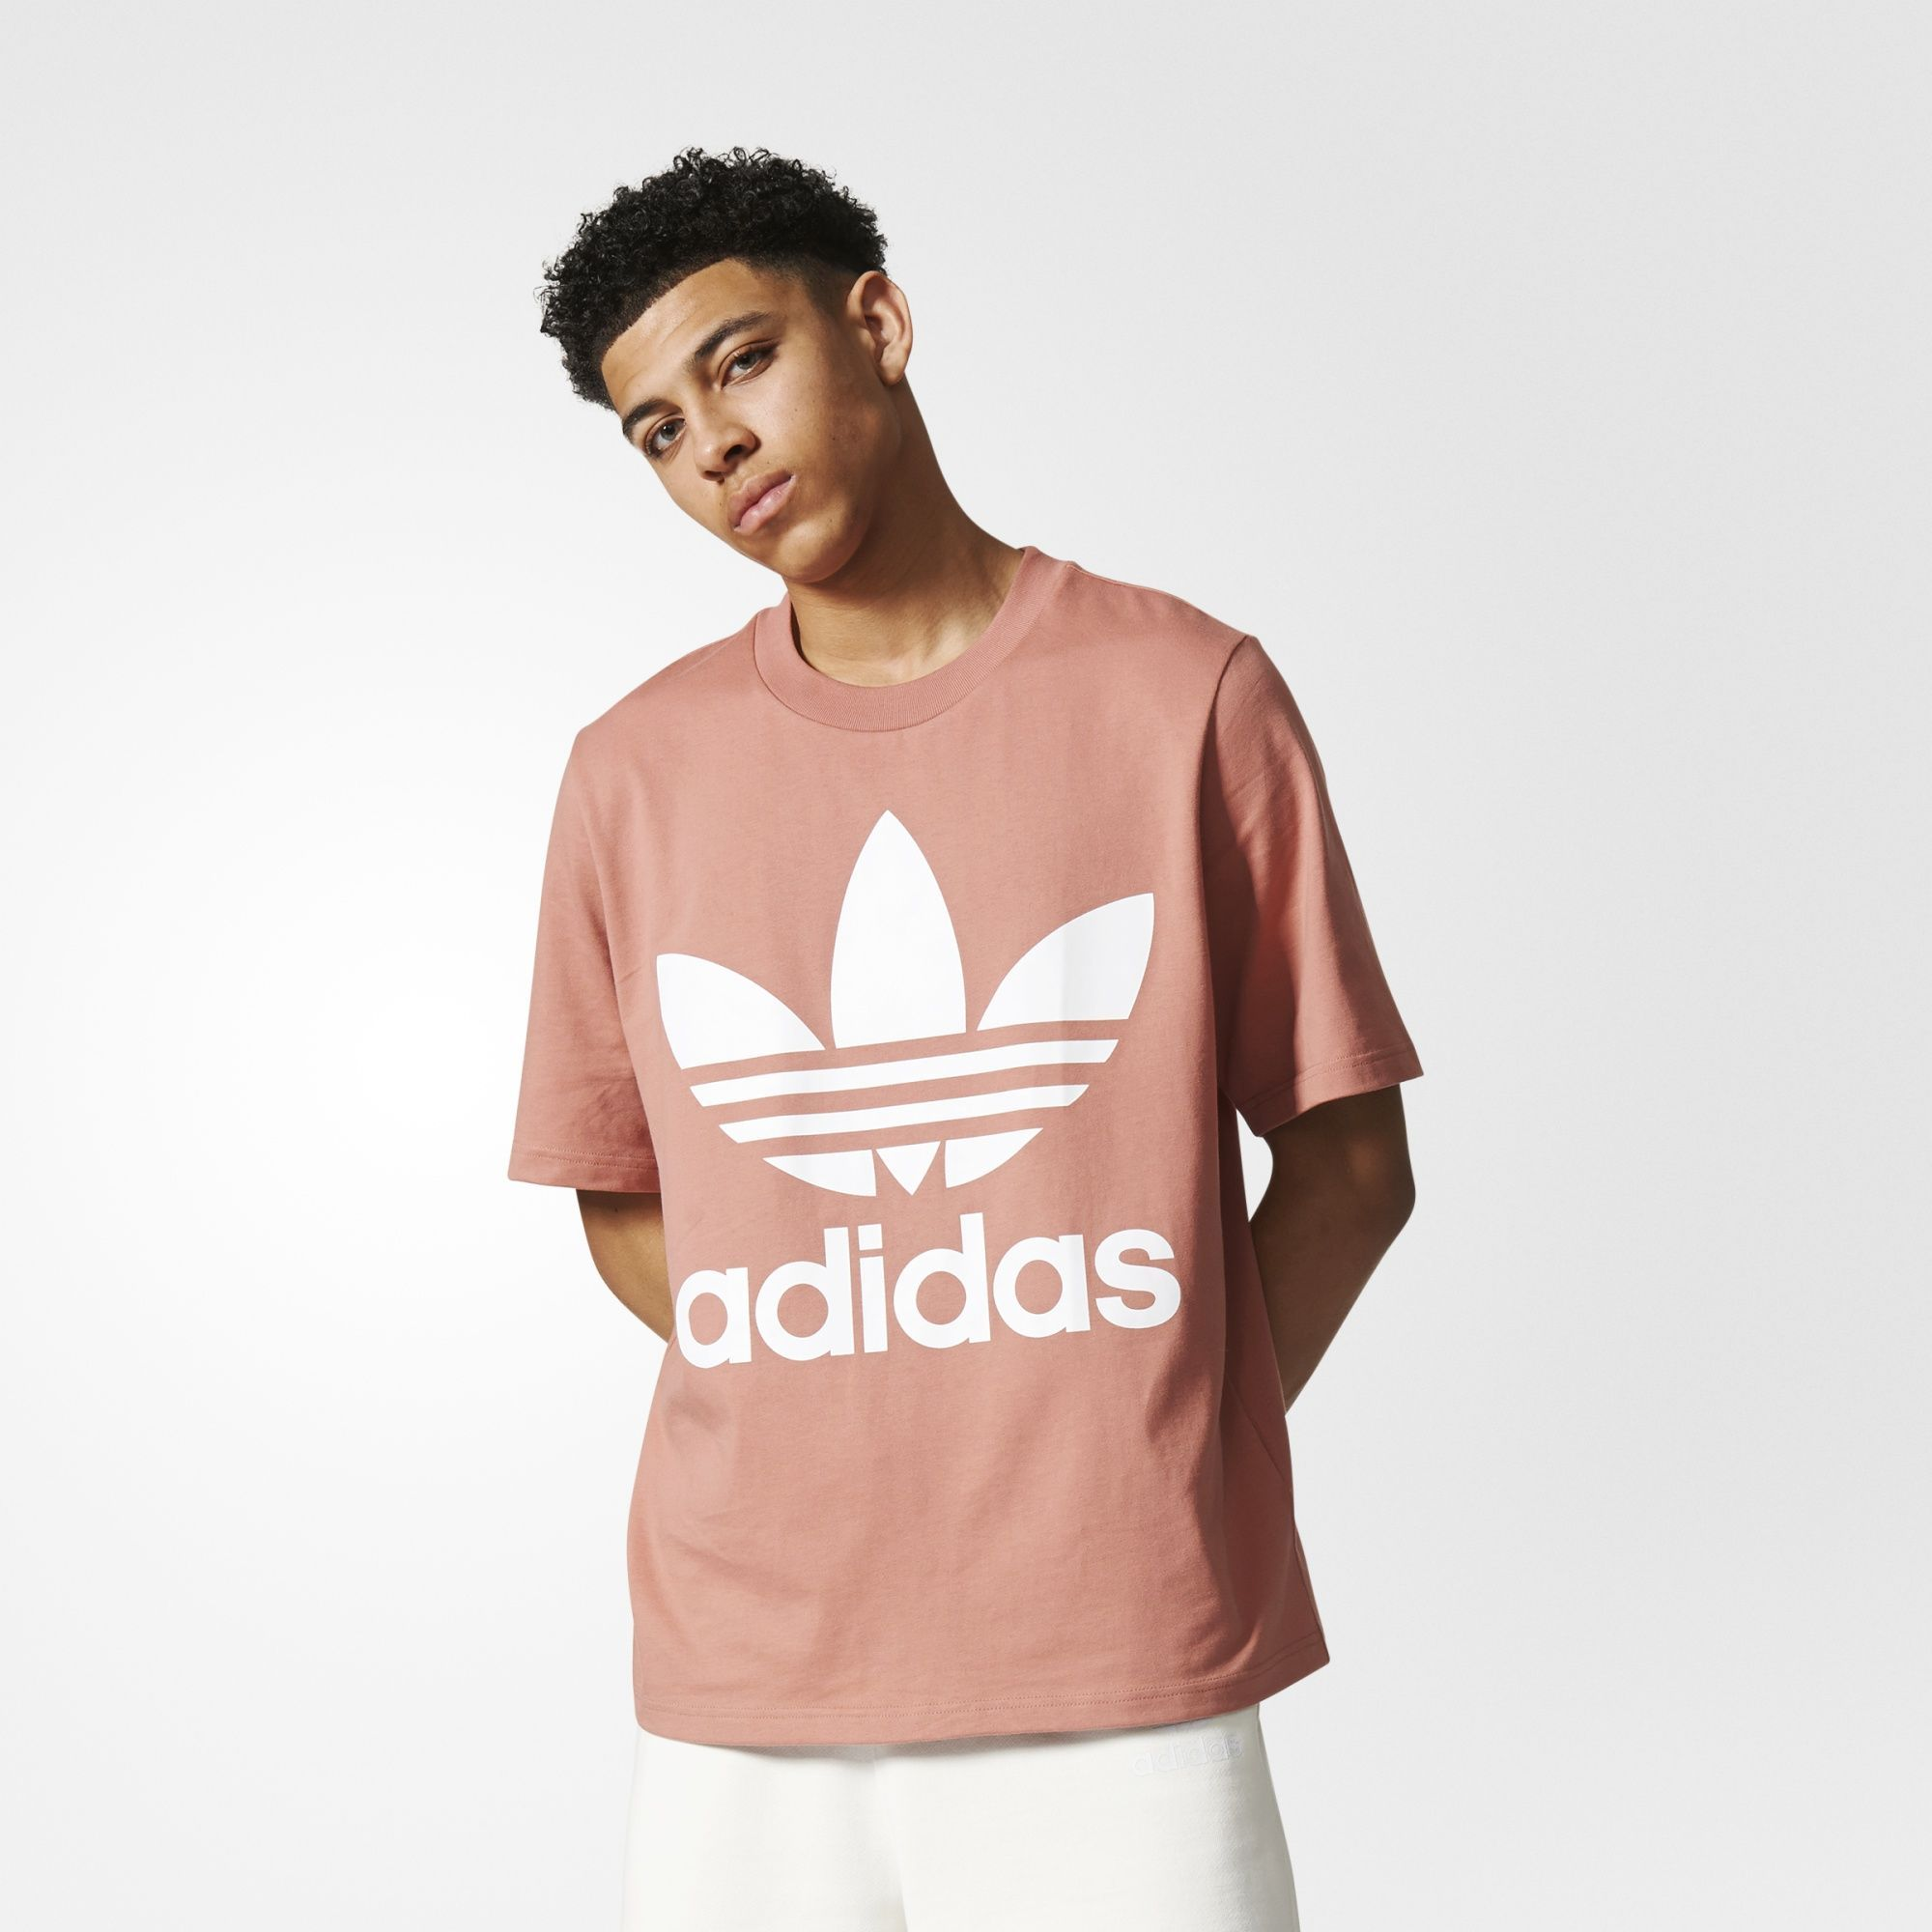 Adidas squadrata tee Uomo t shirt adidas, rosa adidas e calvo